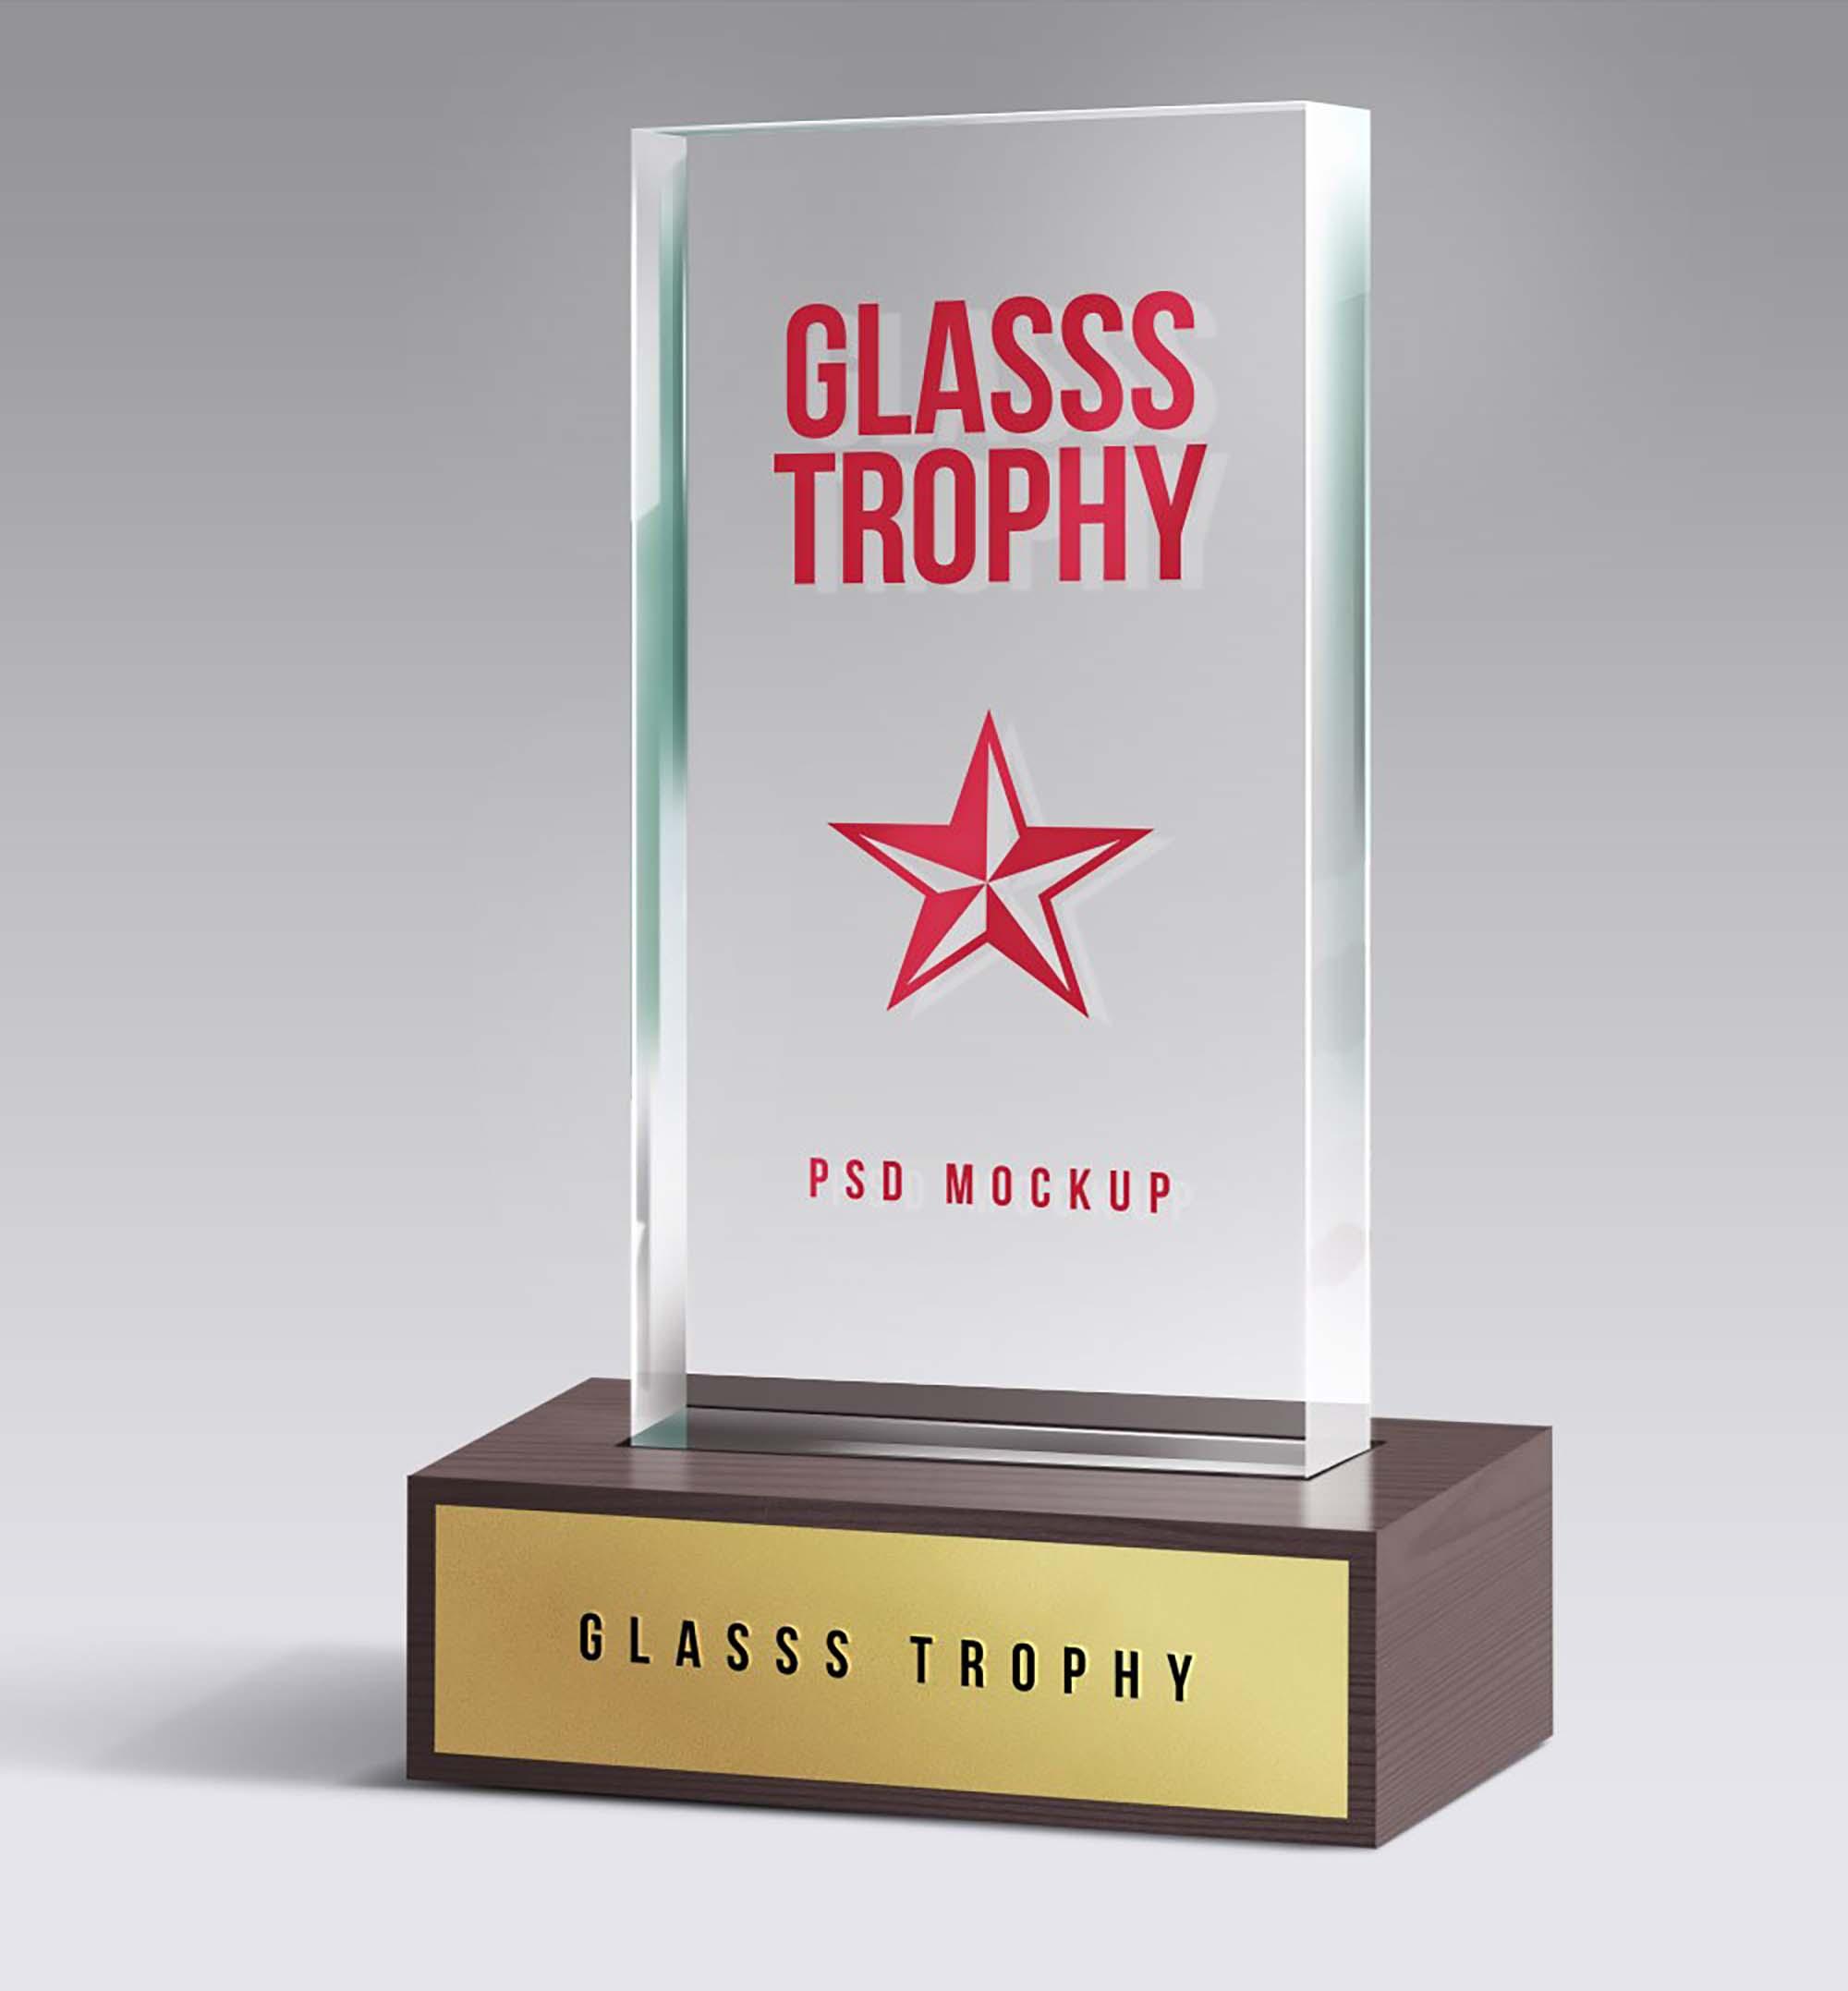 Glass Trophy Mockup